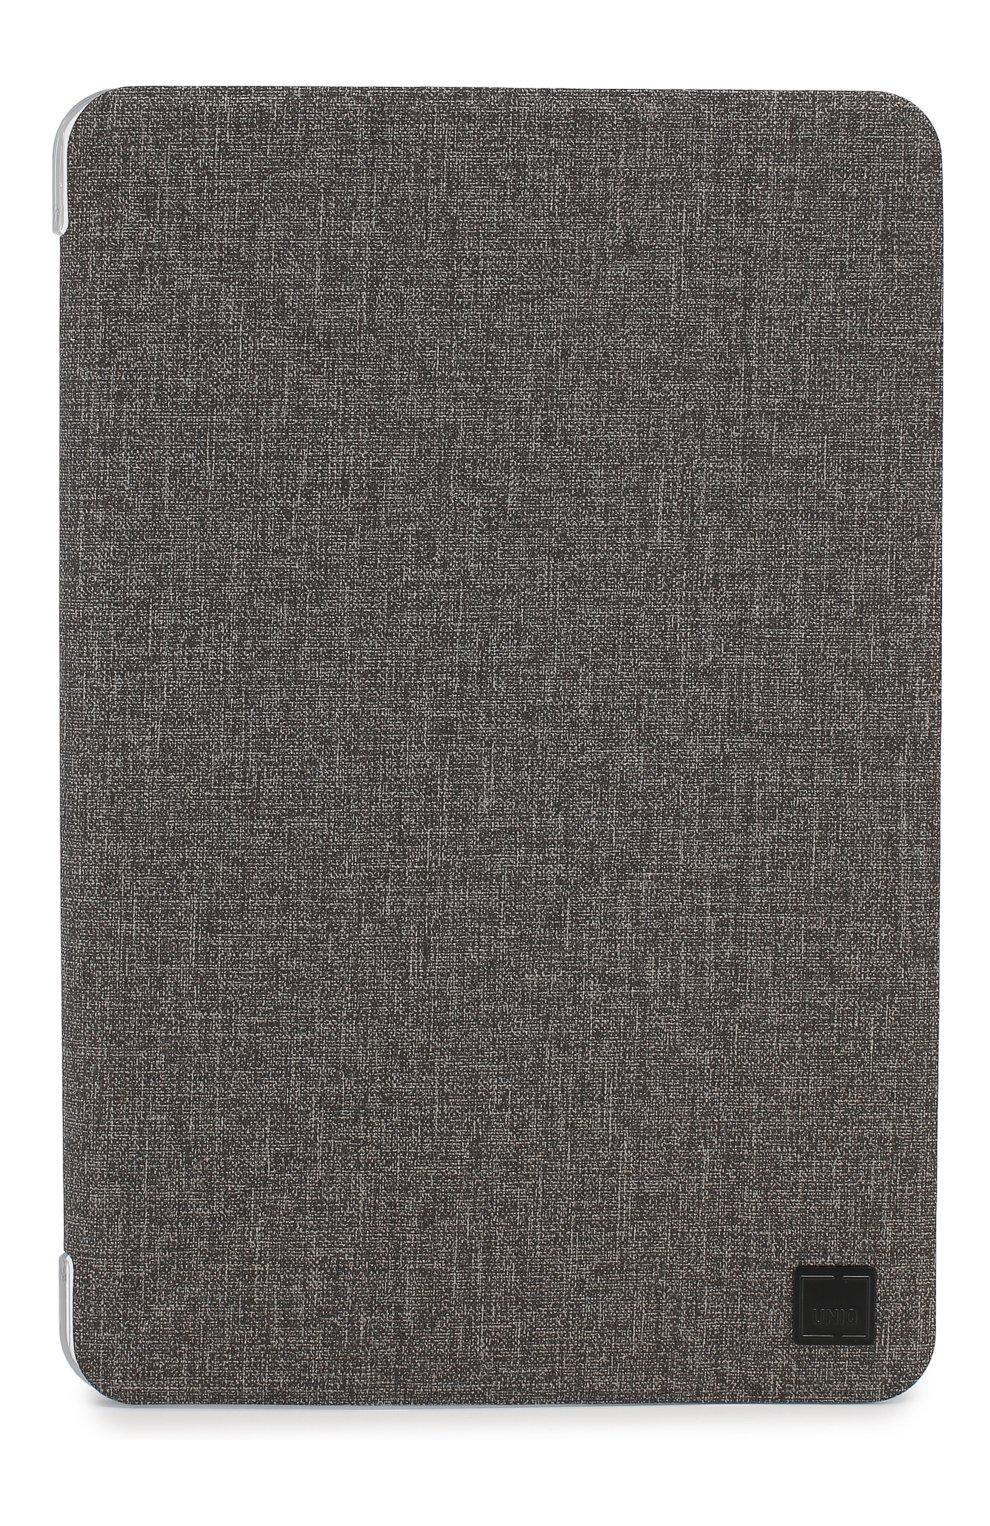 Мужской чехол для ipad mini 5 UNIQ серого цвета, арт. PDM5YKR-KNVGRY   Фото 1